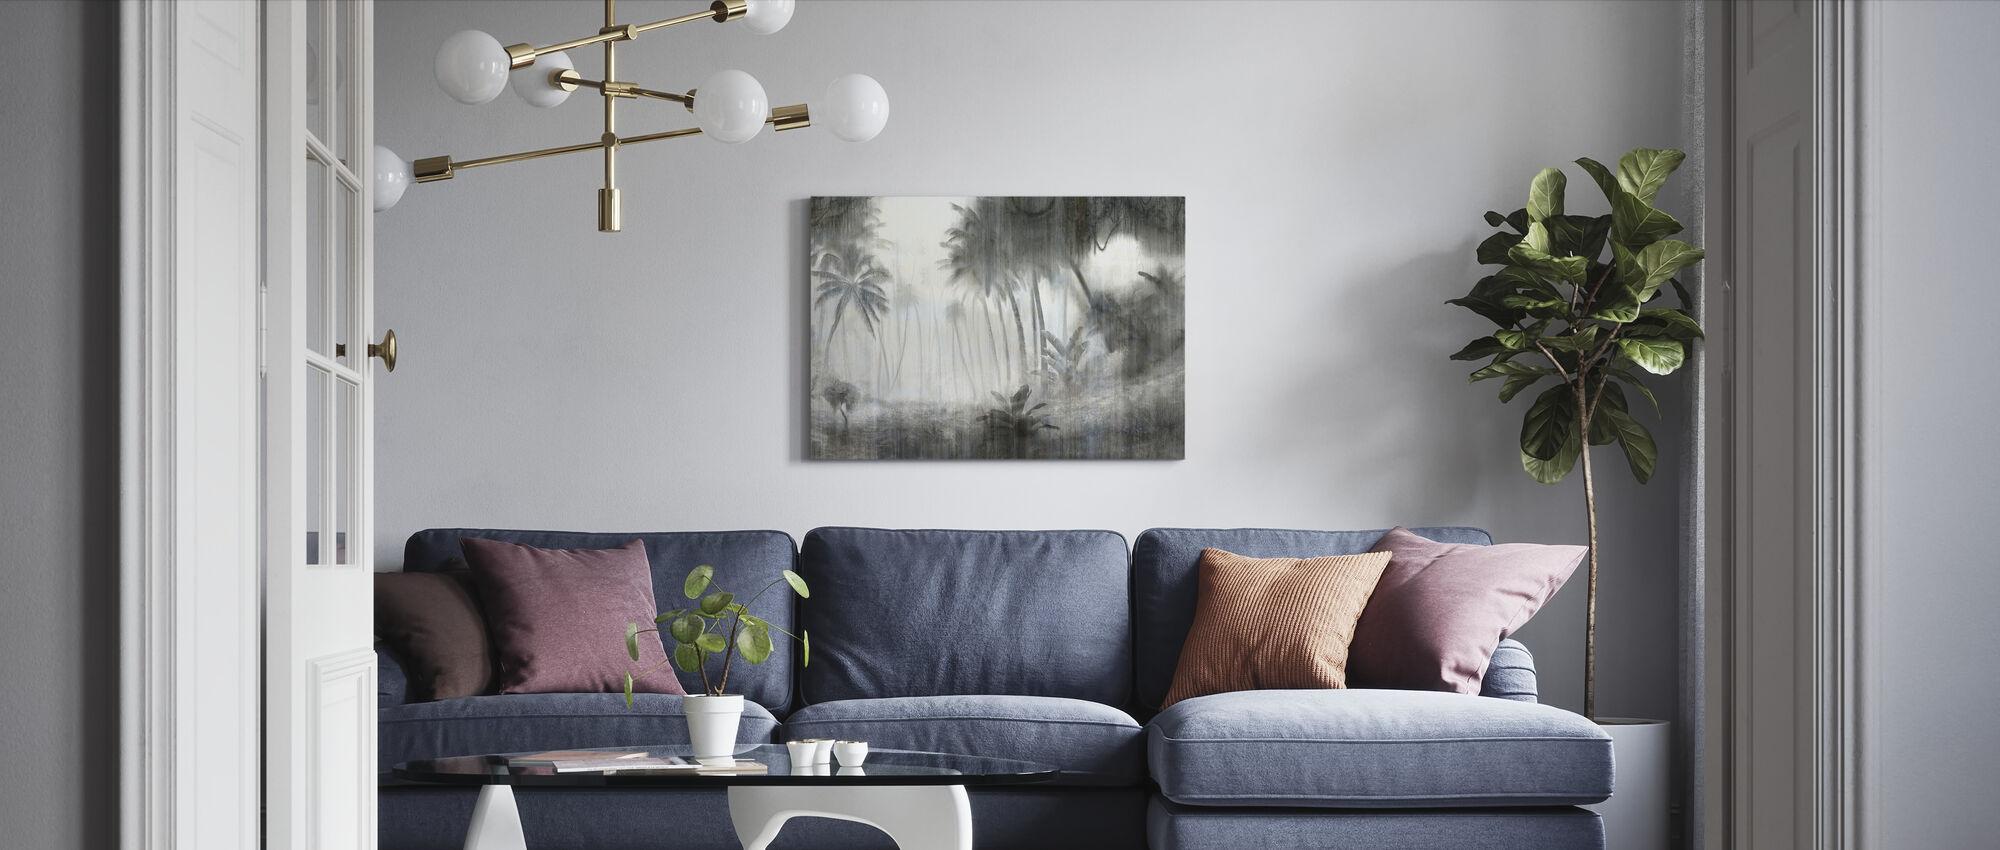 Definitive Tropical - Bright - Canvas print - Living Room